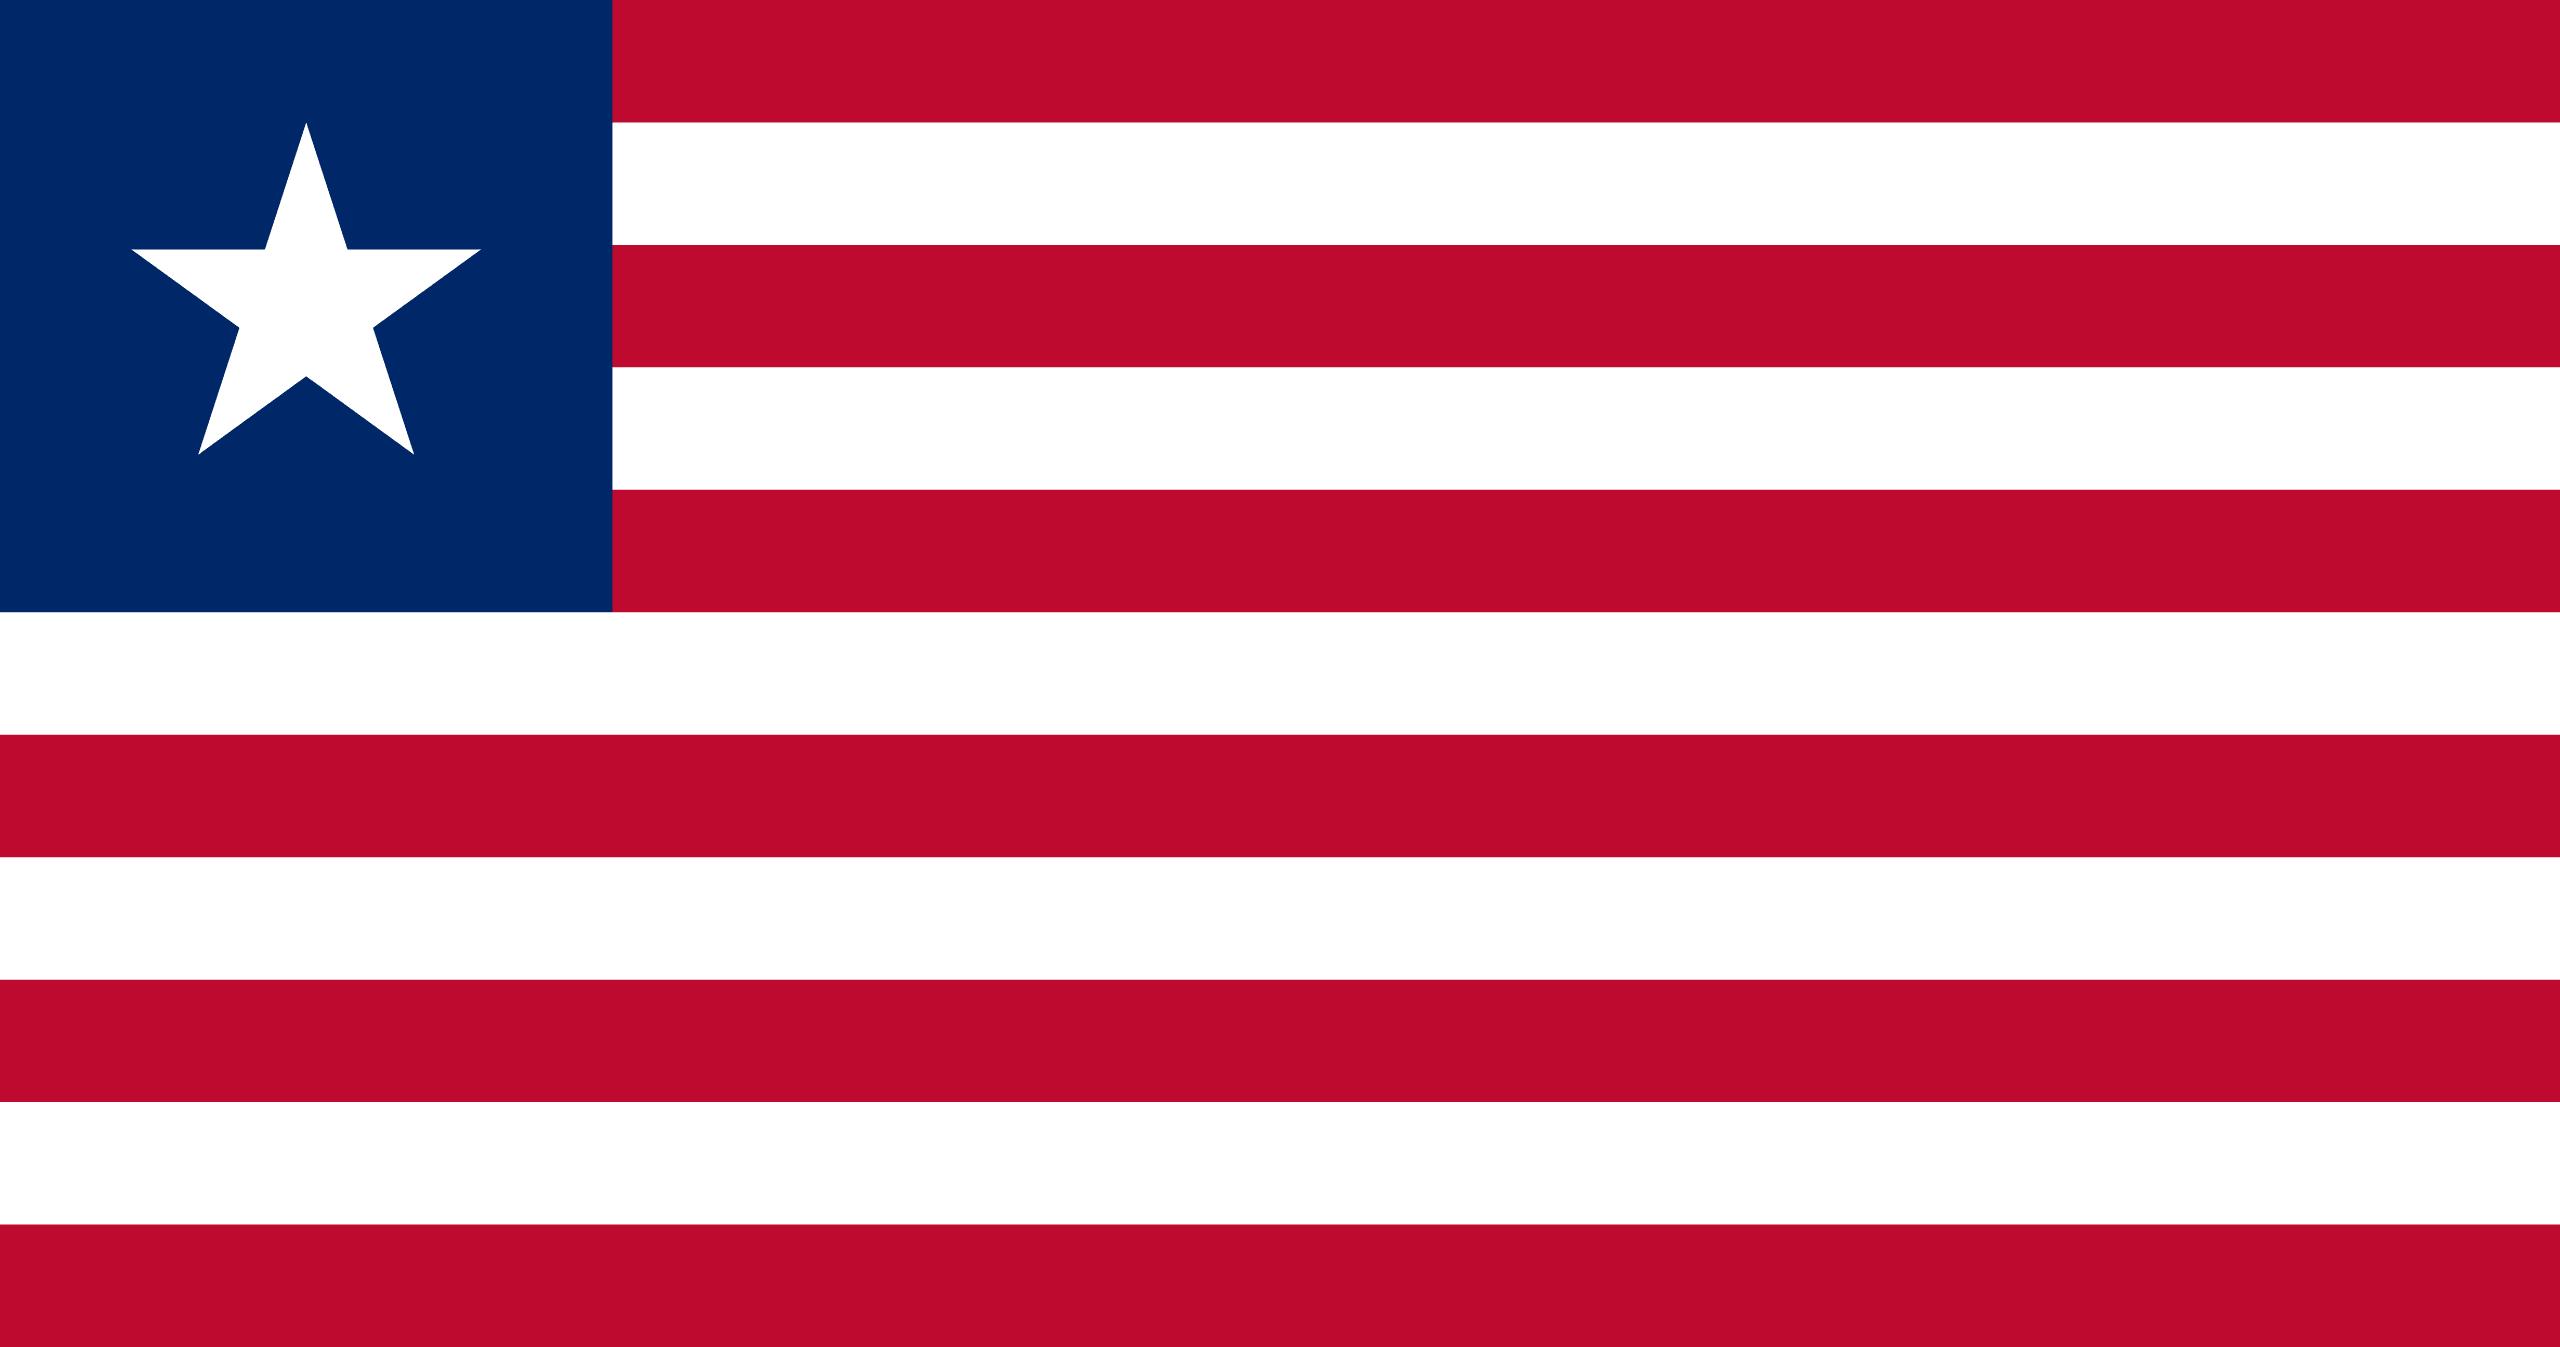 Mini Of Monrovia >> Drapeau du Liberia 🇱🇷 – Drapeaux du monde